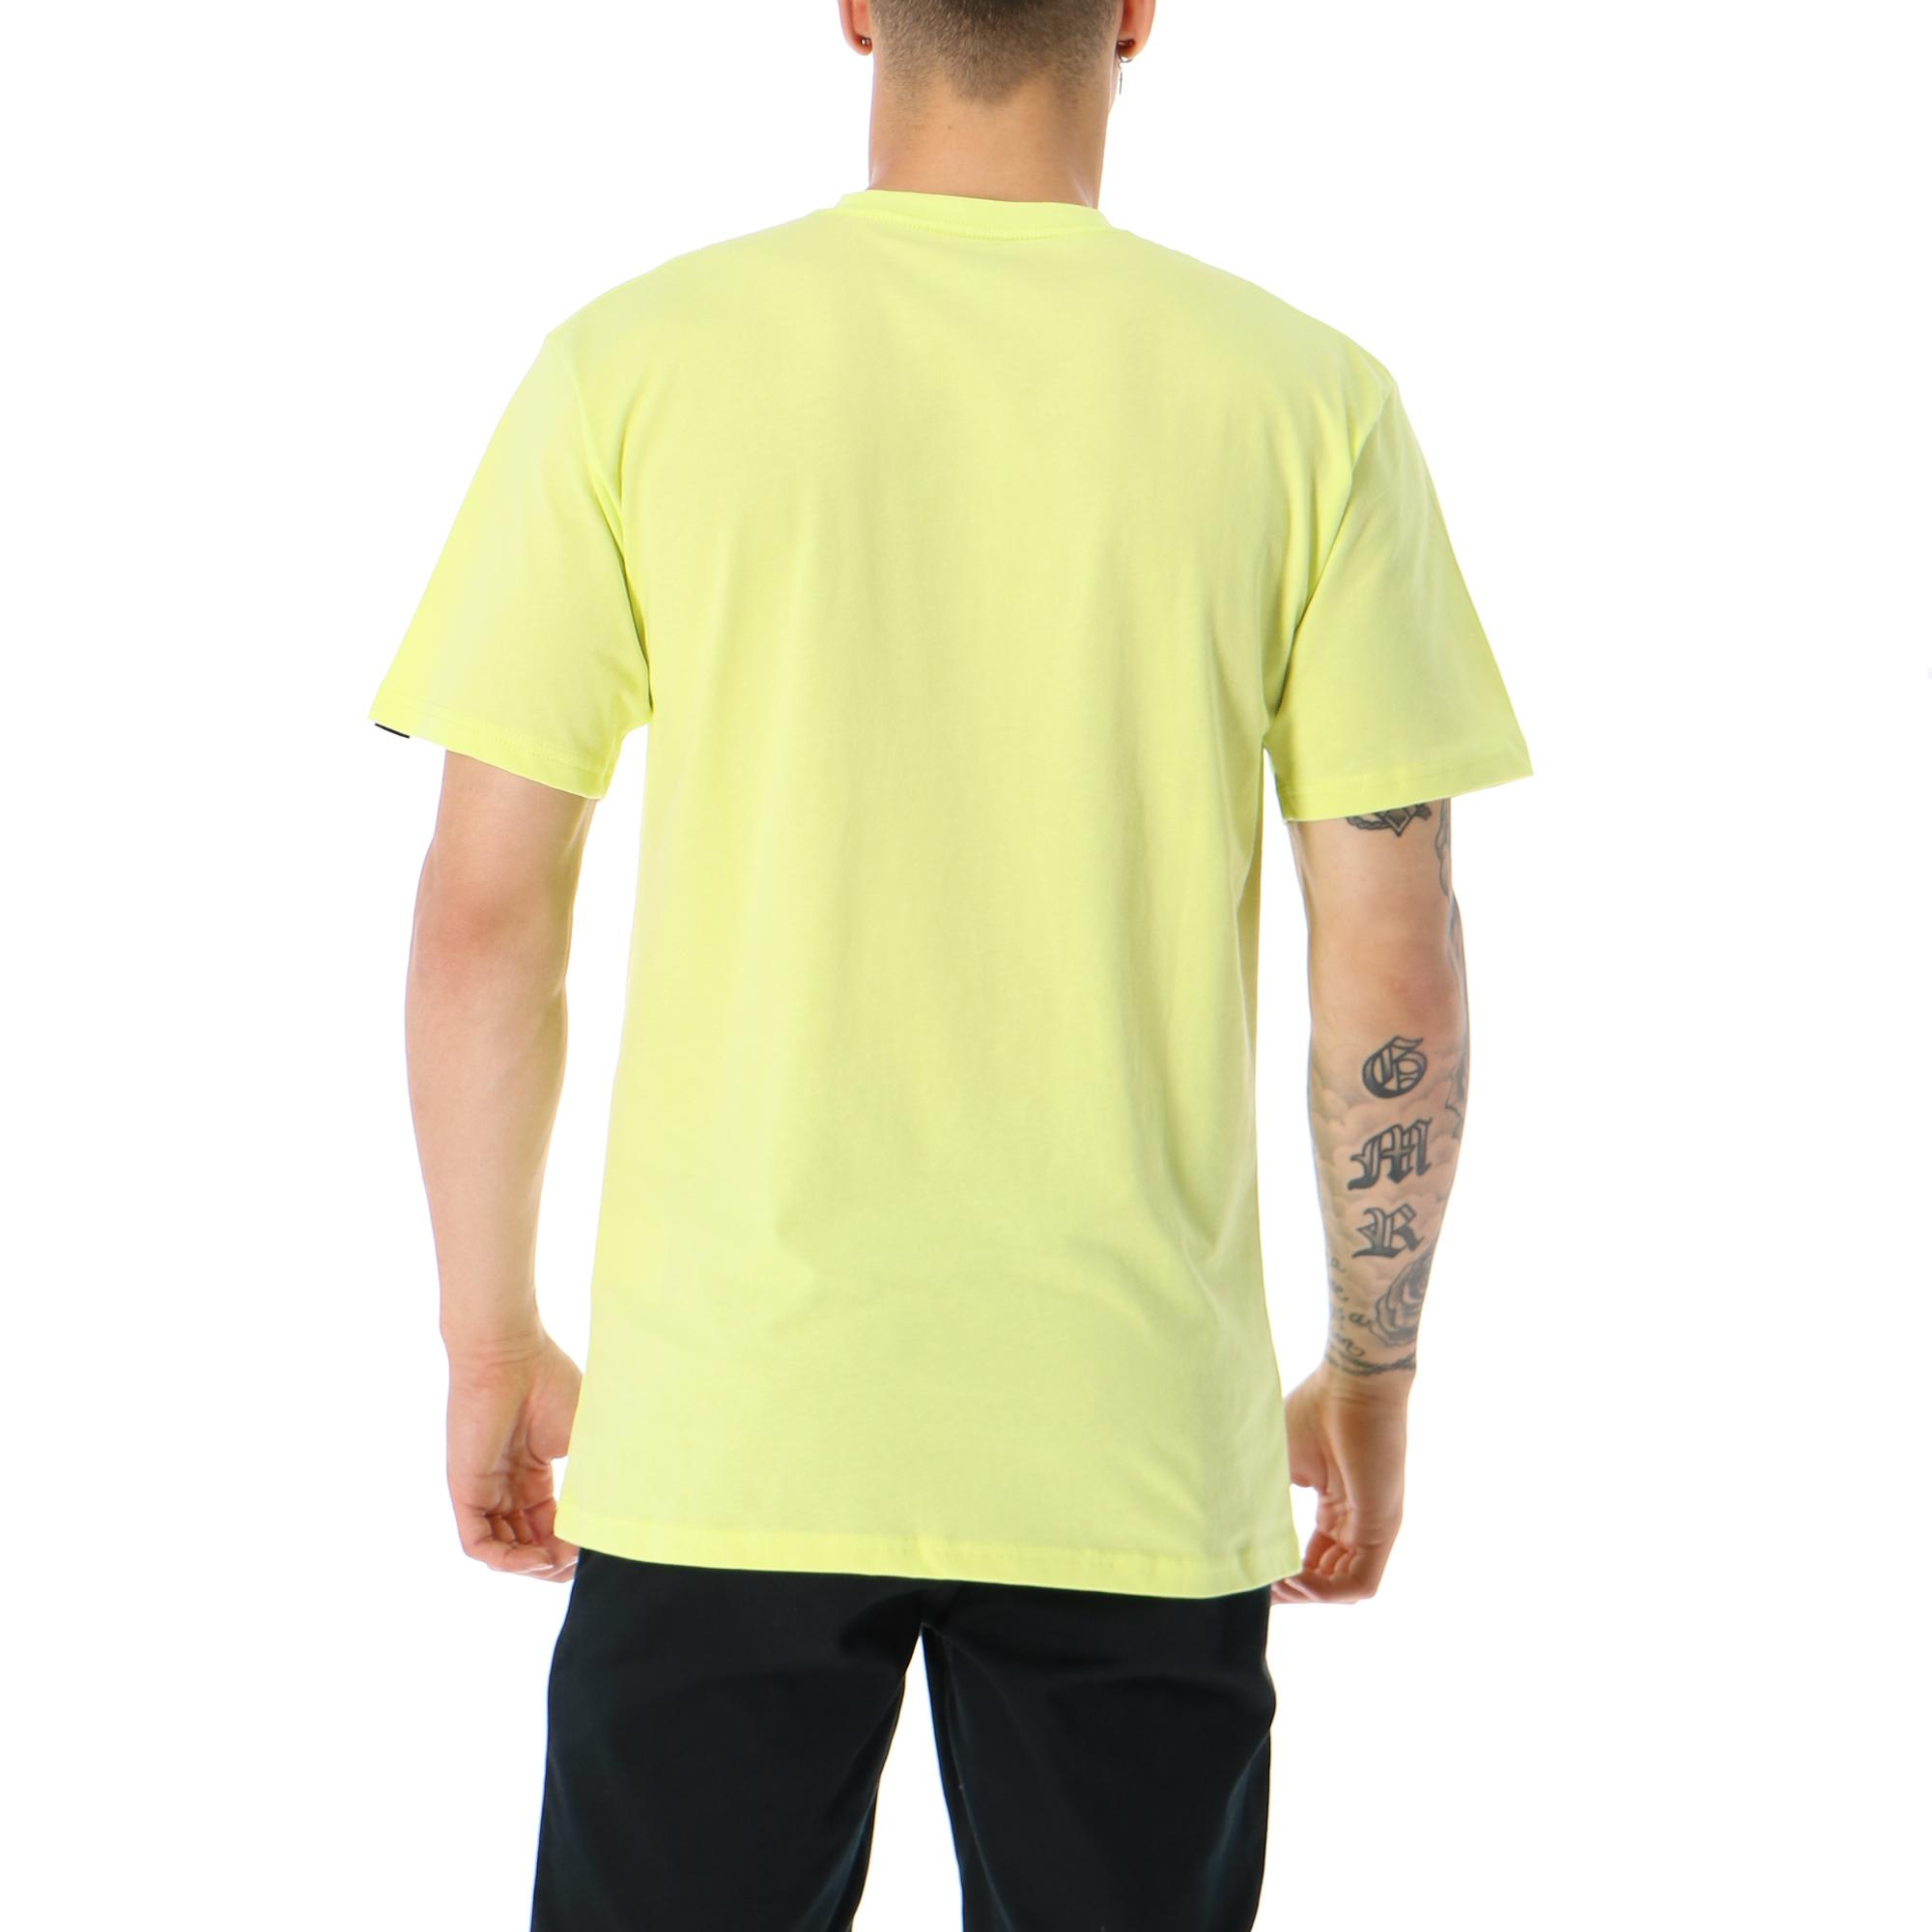 259c396935 Vans Classic Sunny Lime White | Treesse